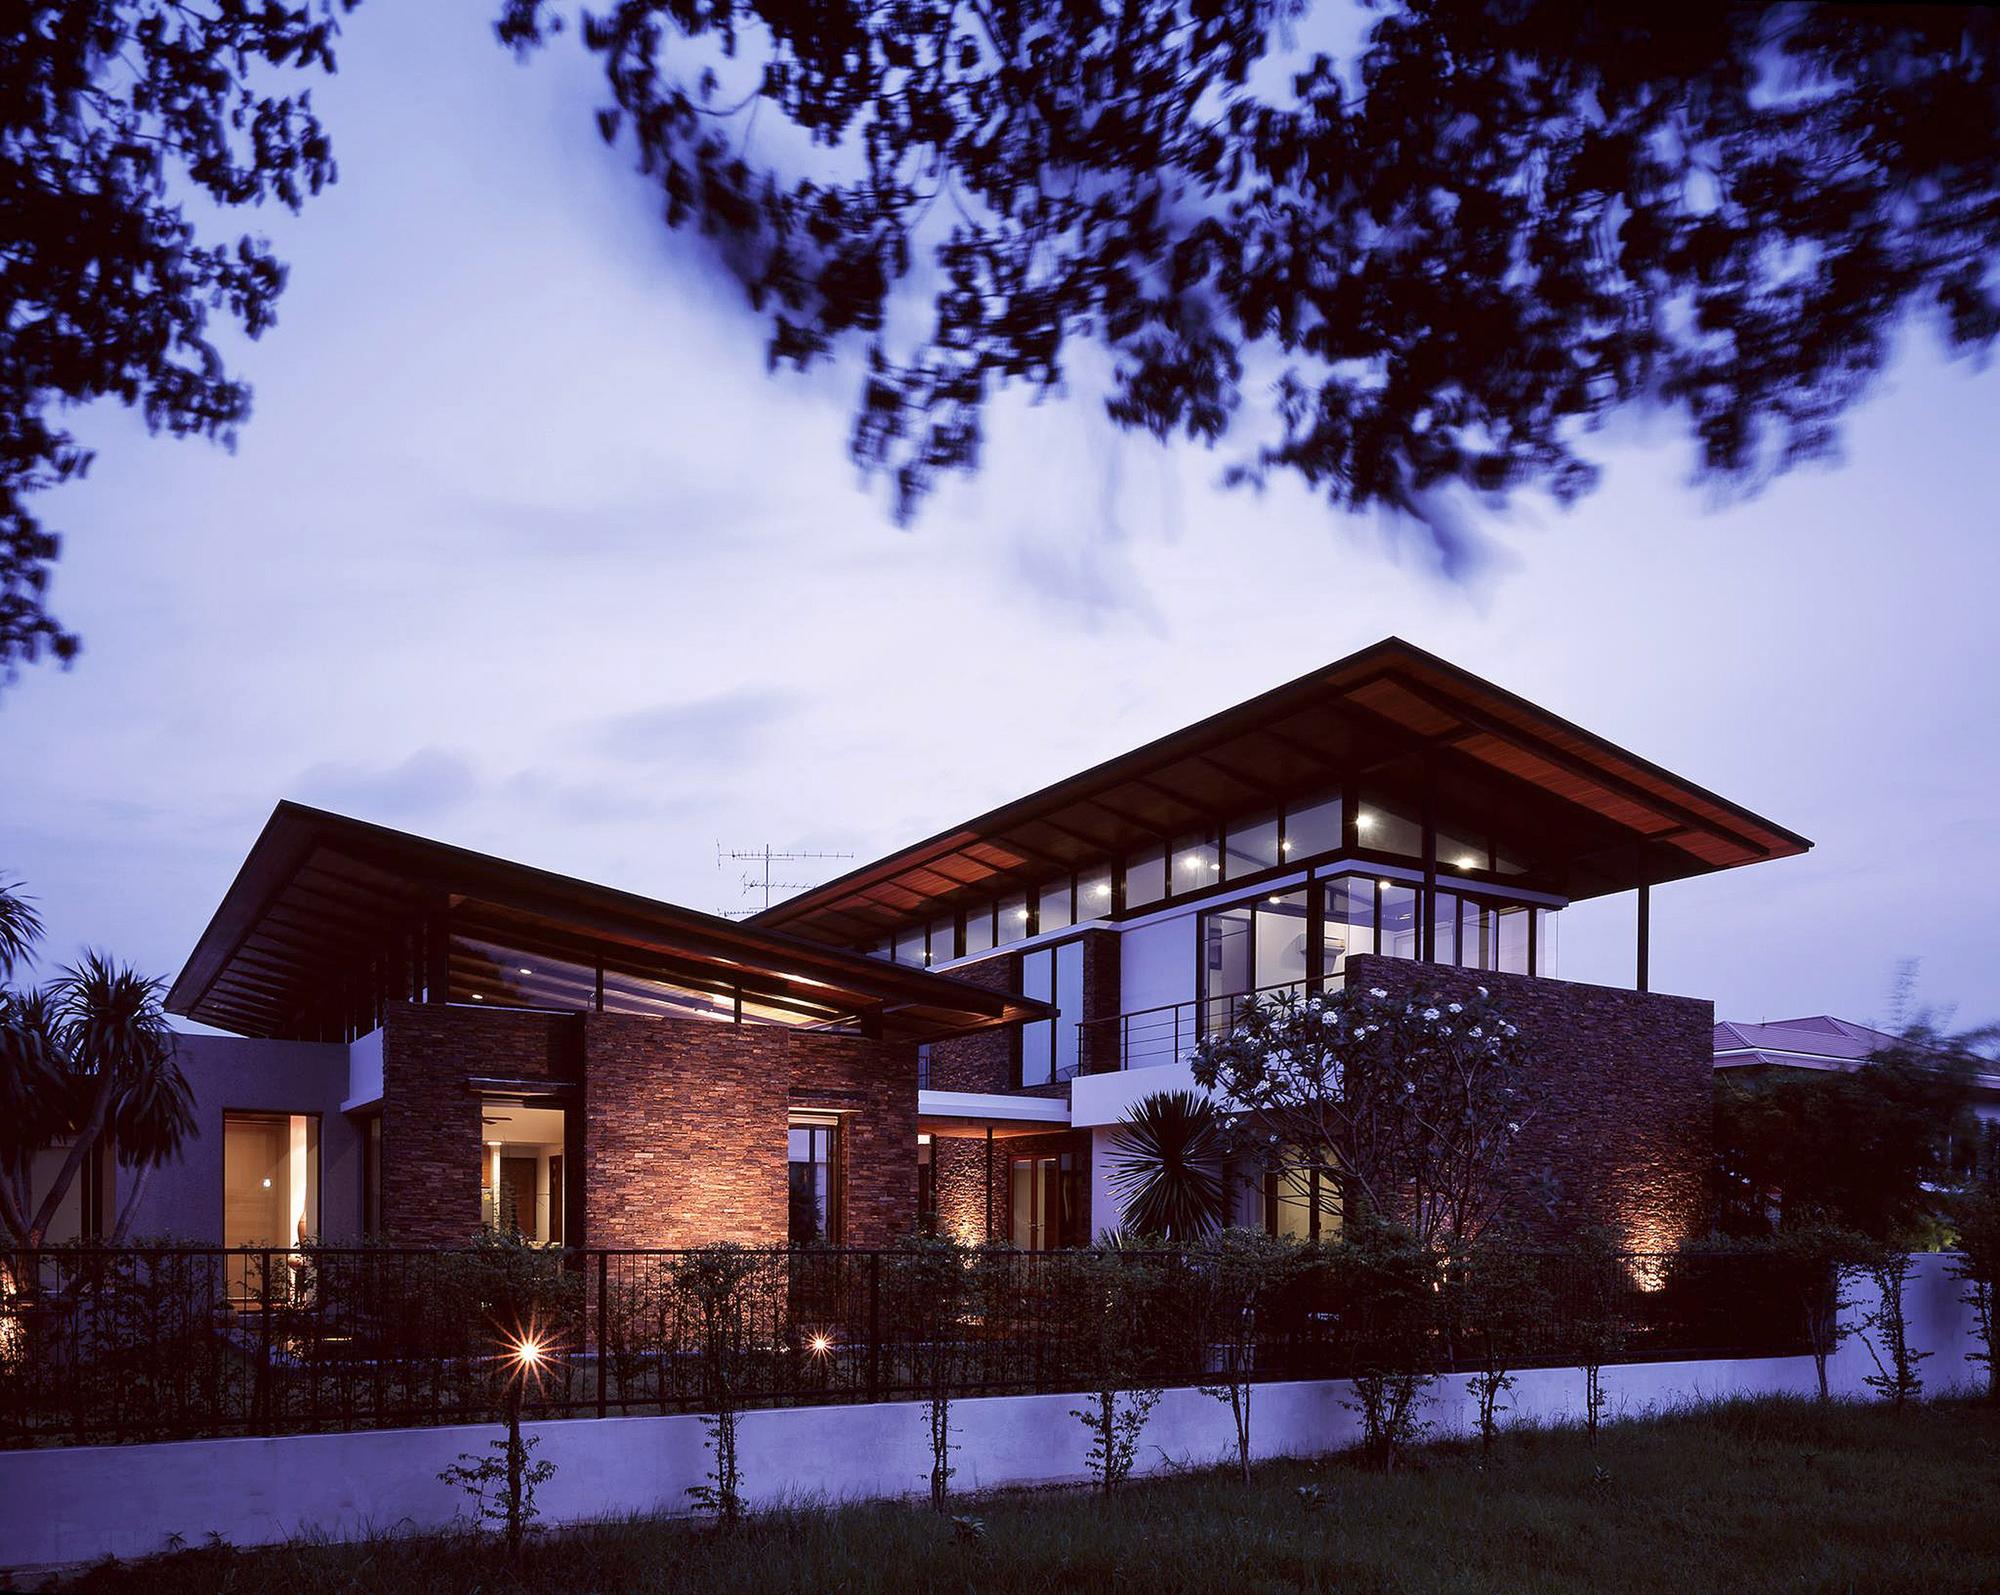 Gallery Of Nature House Junsekino Architect And Design 16